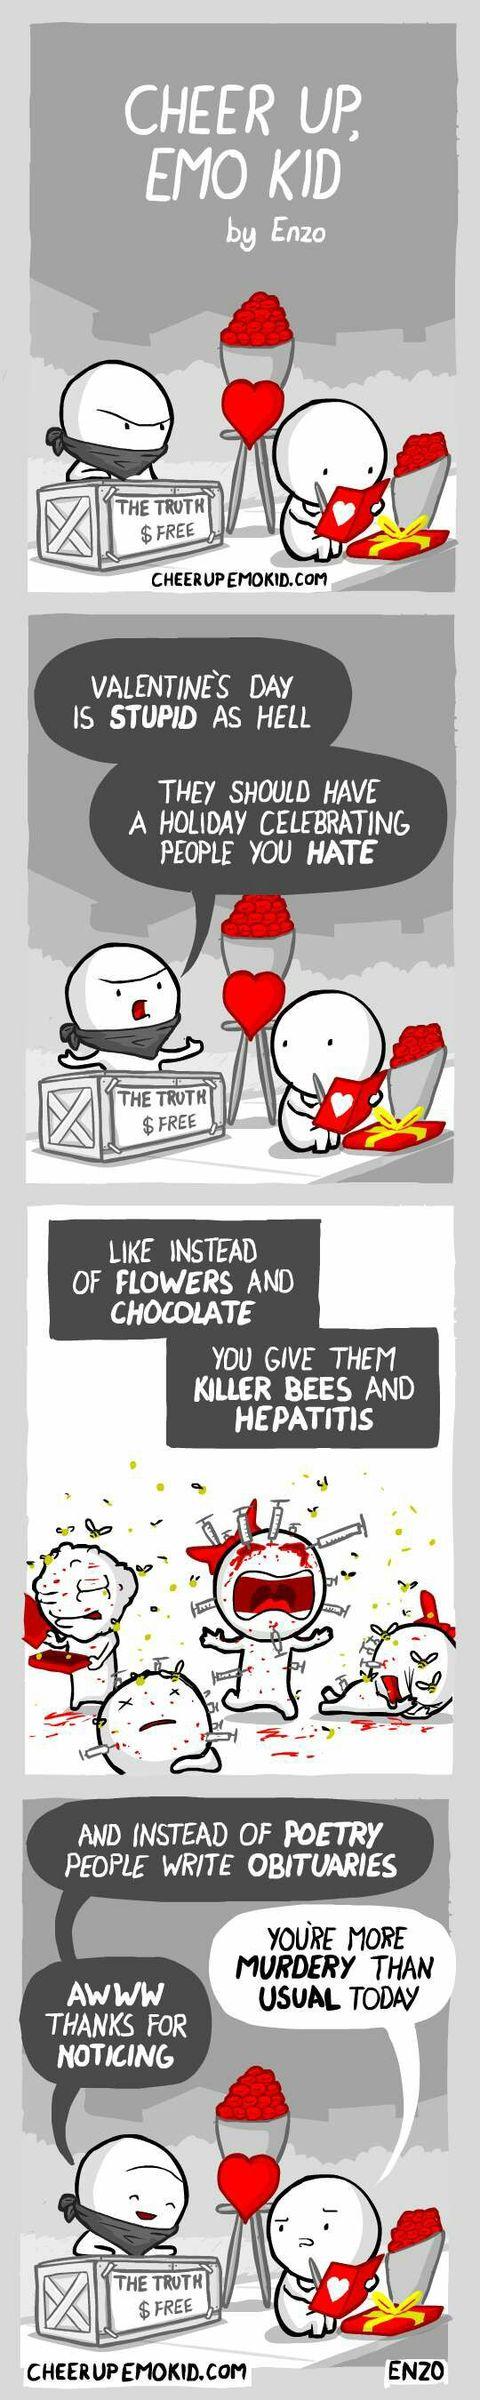 valentines day for singles - meme